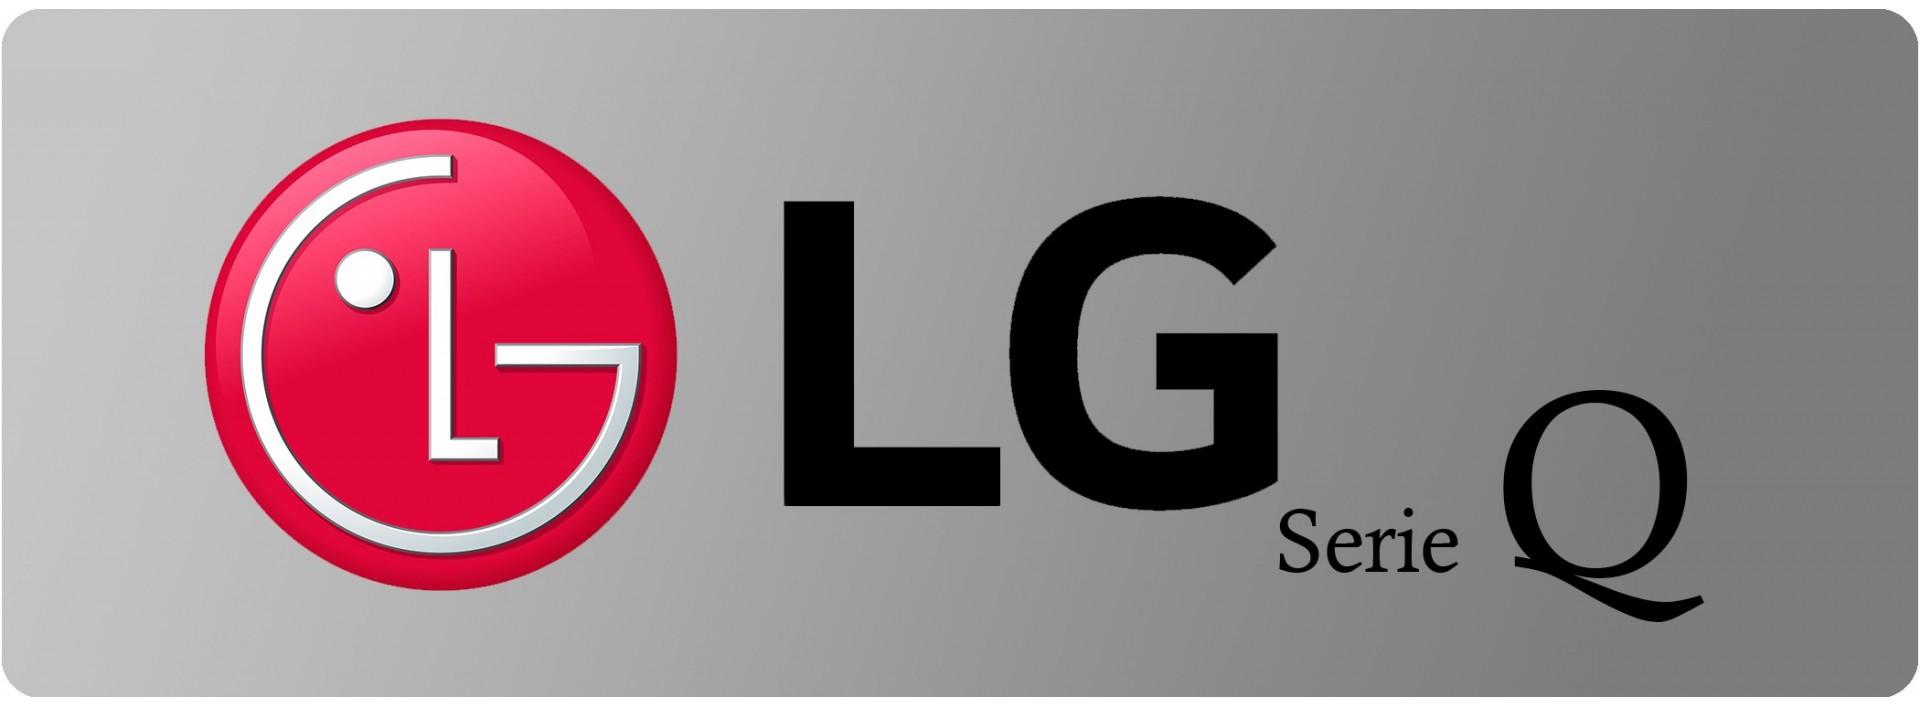 Fundas para LG Serie Q